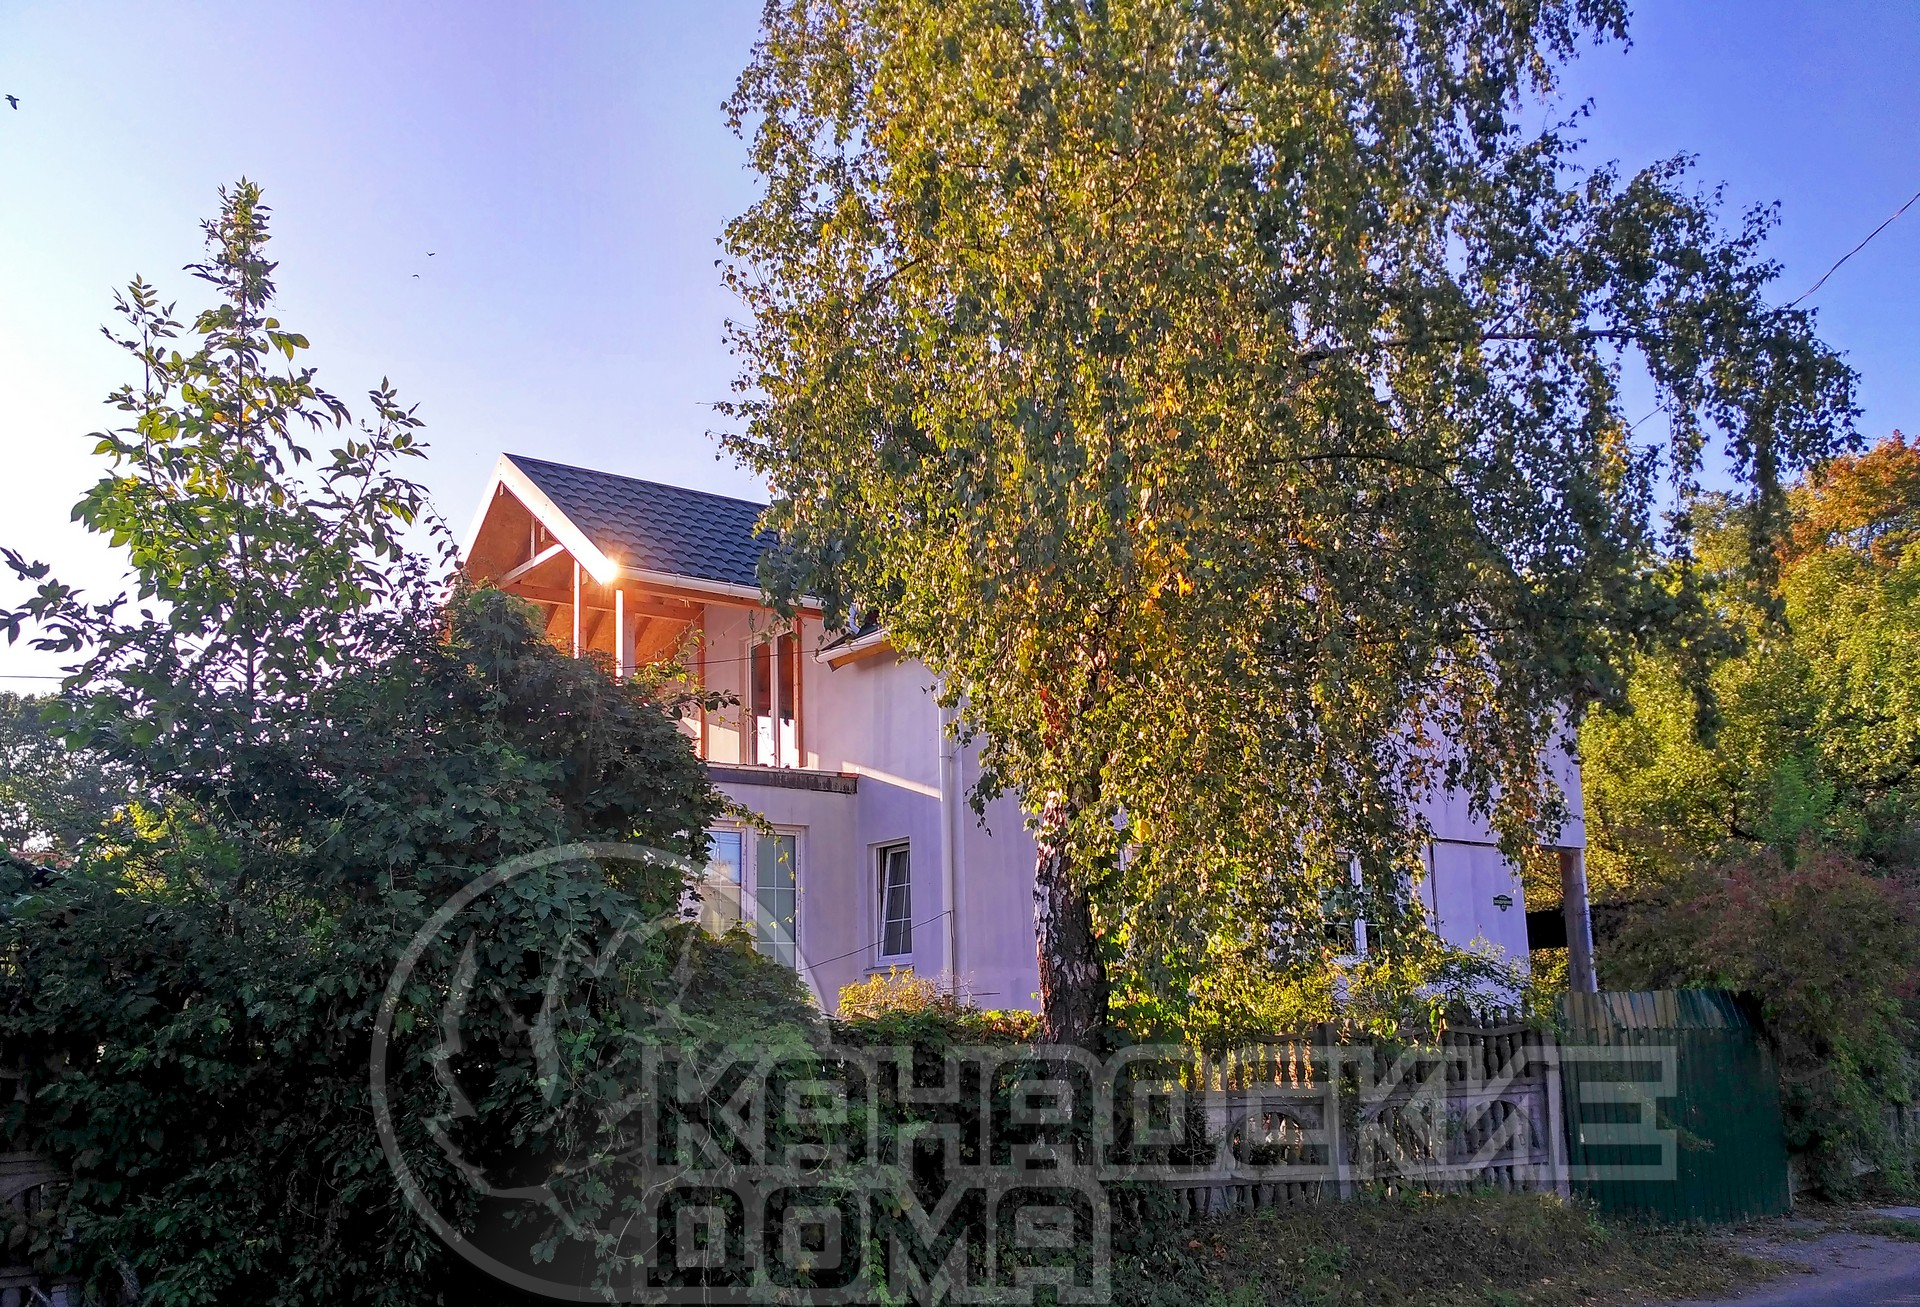 rekonstrukciya-doma-sip-kanadskie-doma_15